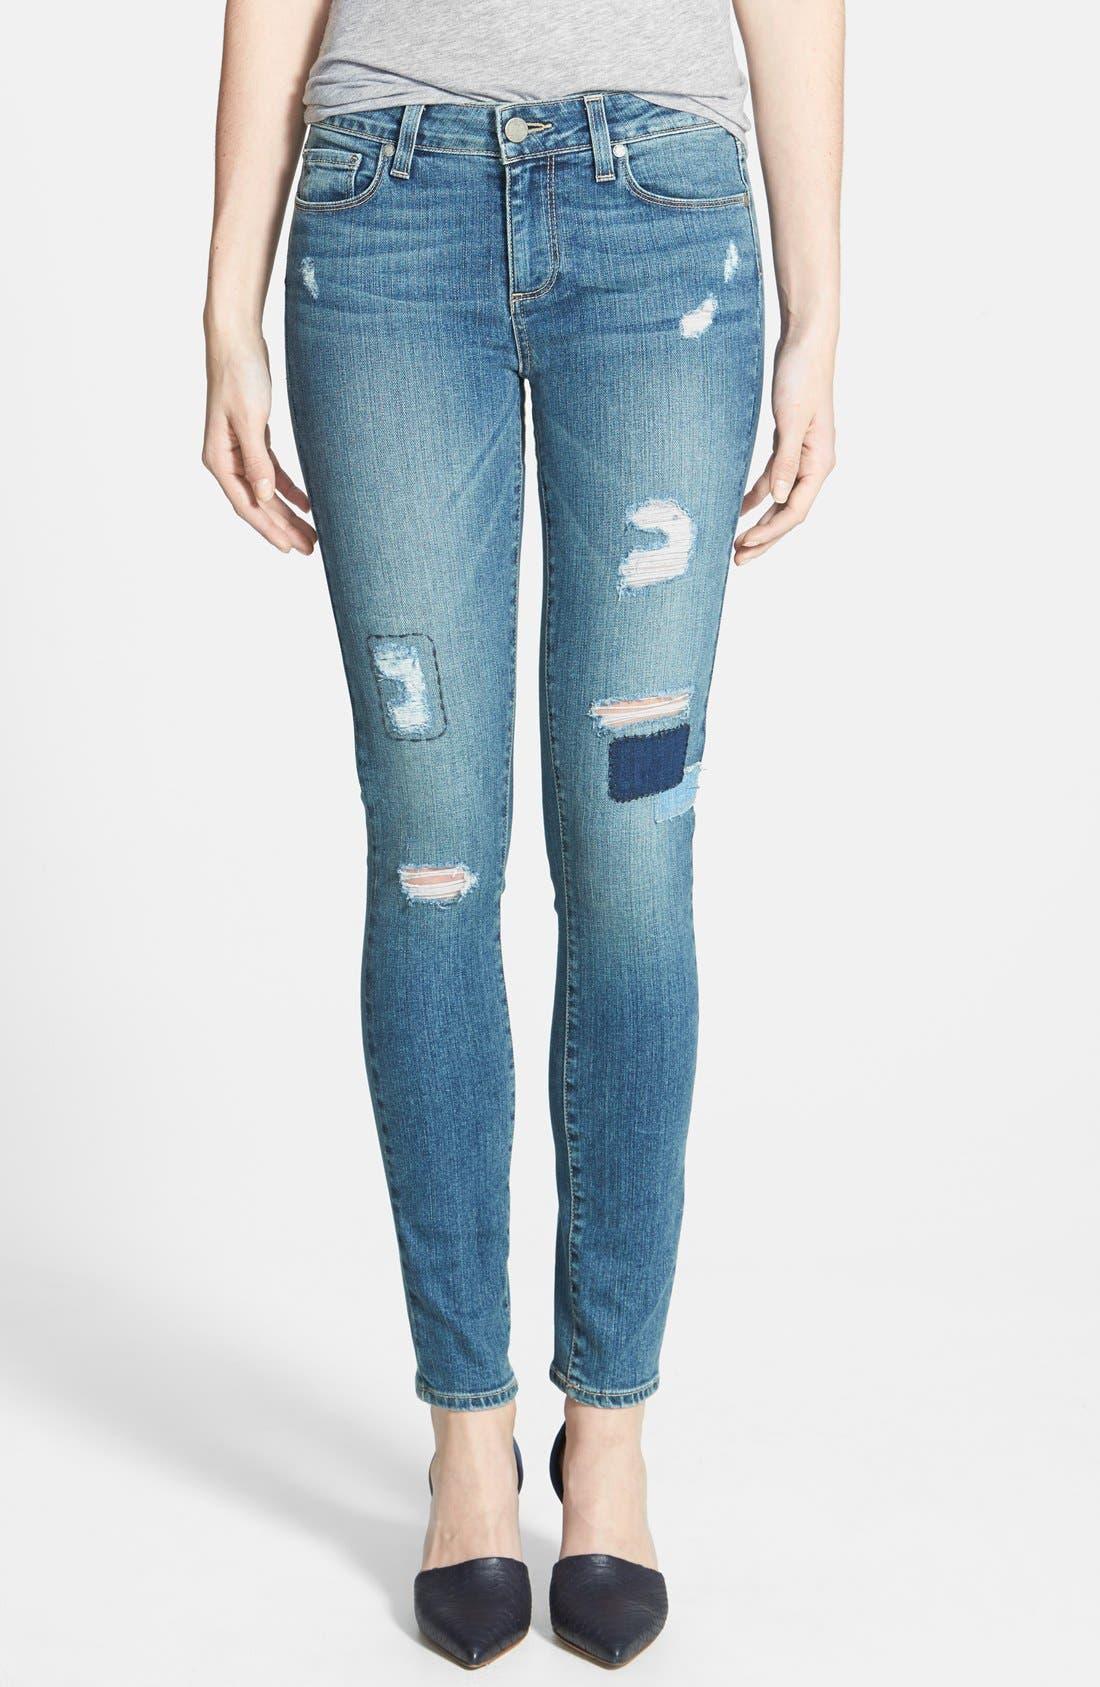 Main Image - Paige Denim 'Verdugo' Ultra Skinny Jeans (Dazeley Destructed)